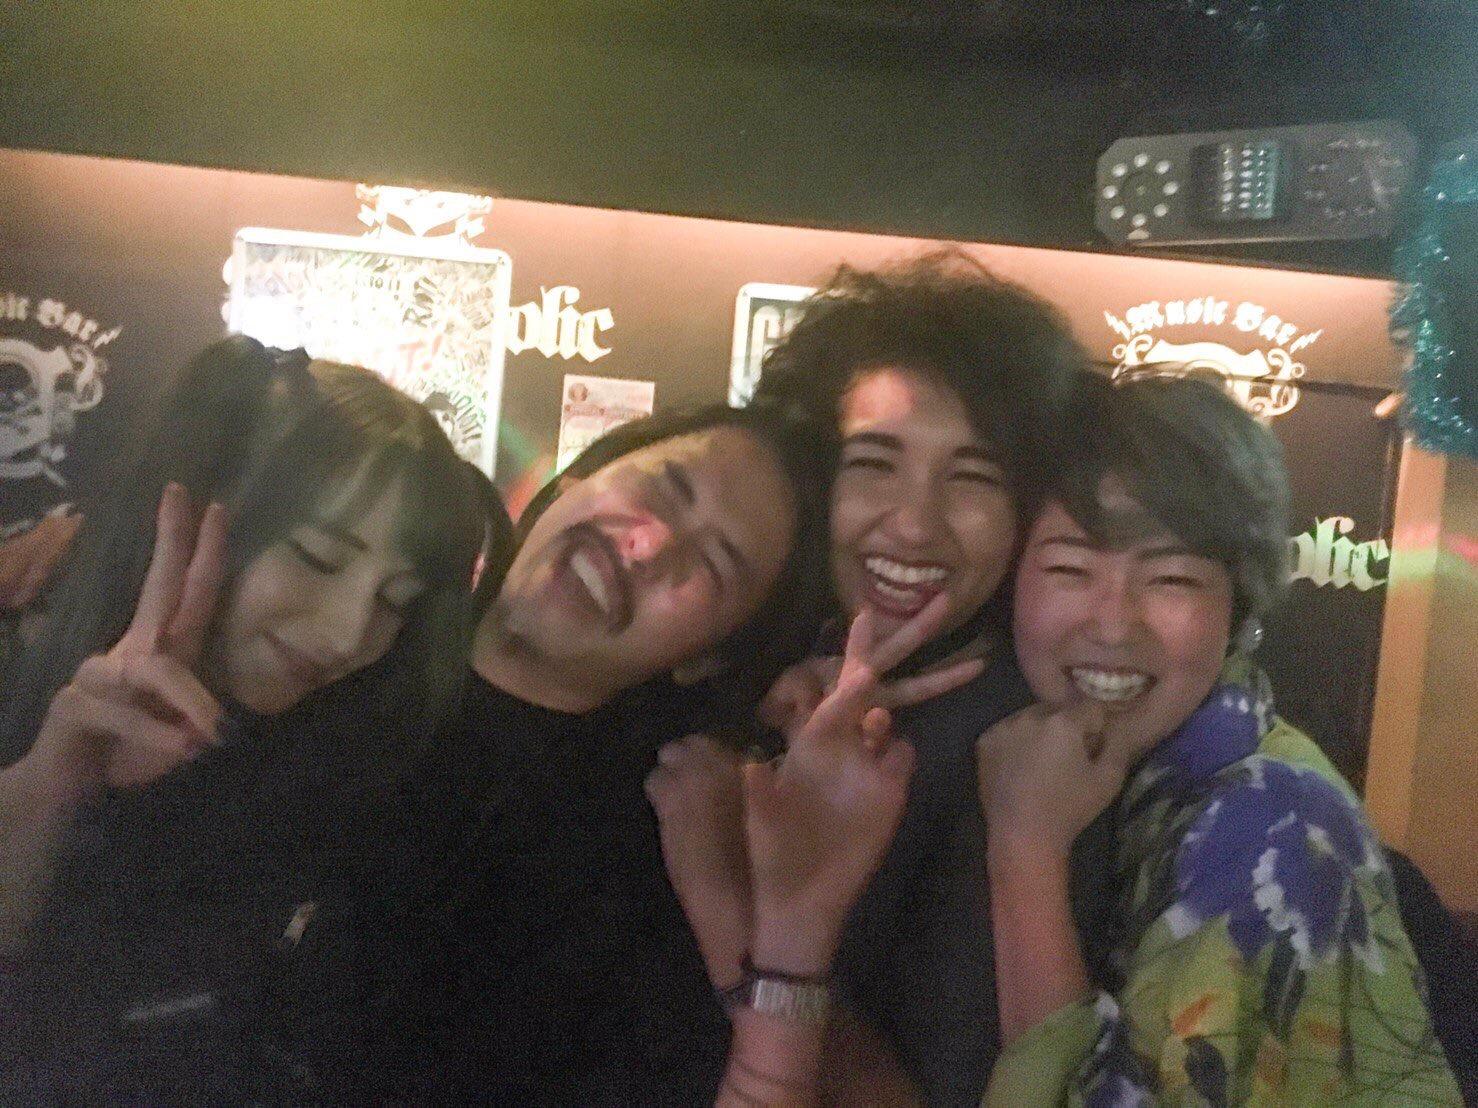 https://bar-rockaholic.jp/shibuya/blog/3DF79379-0B74-491A-926F-BEF56AA6B8D5.jpeg